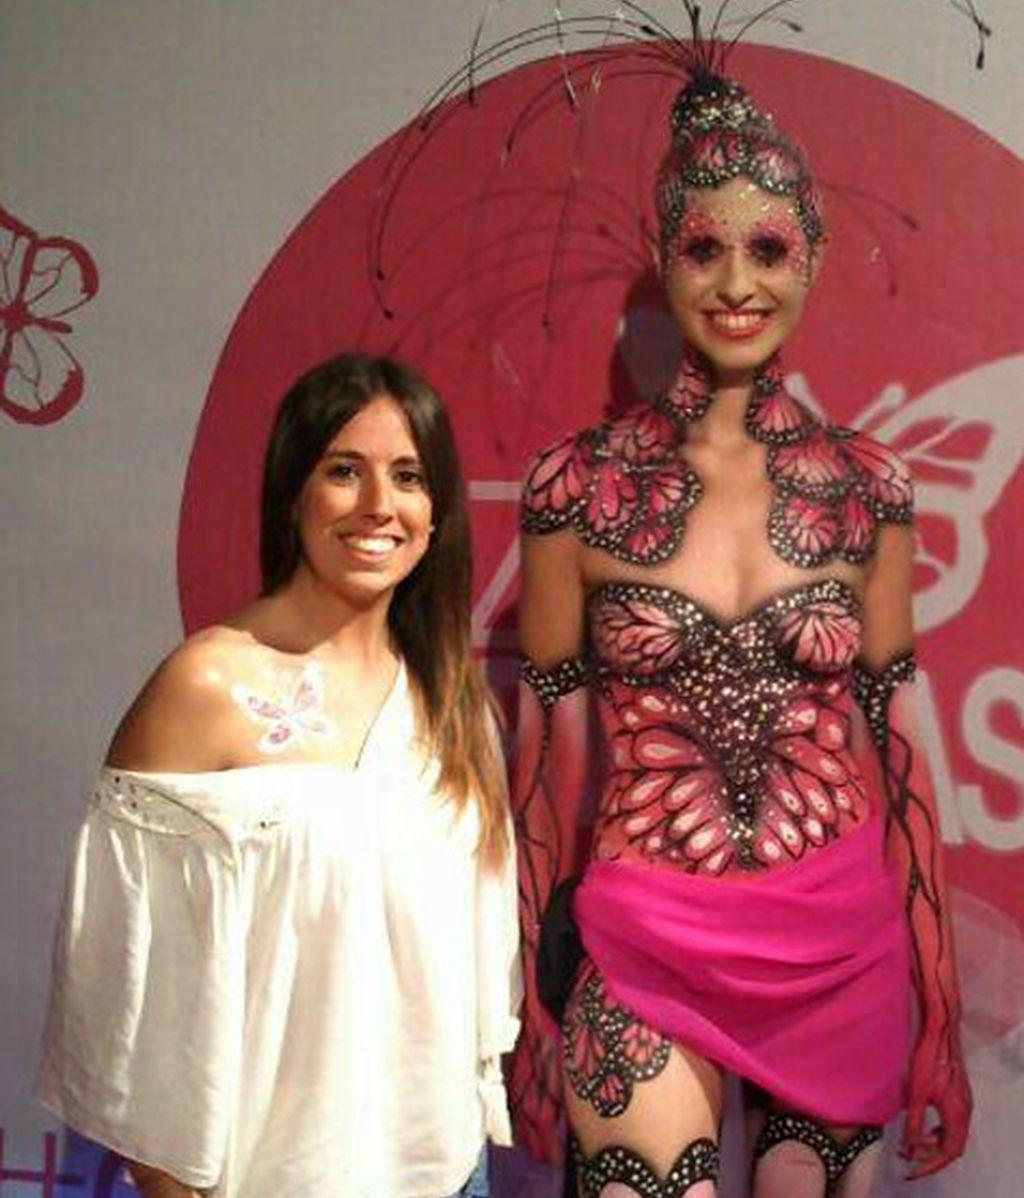 Laura Esteban @Lauritxu87, guapísima junto a nuestra 'mariposa humana'